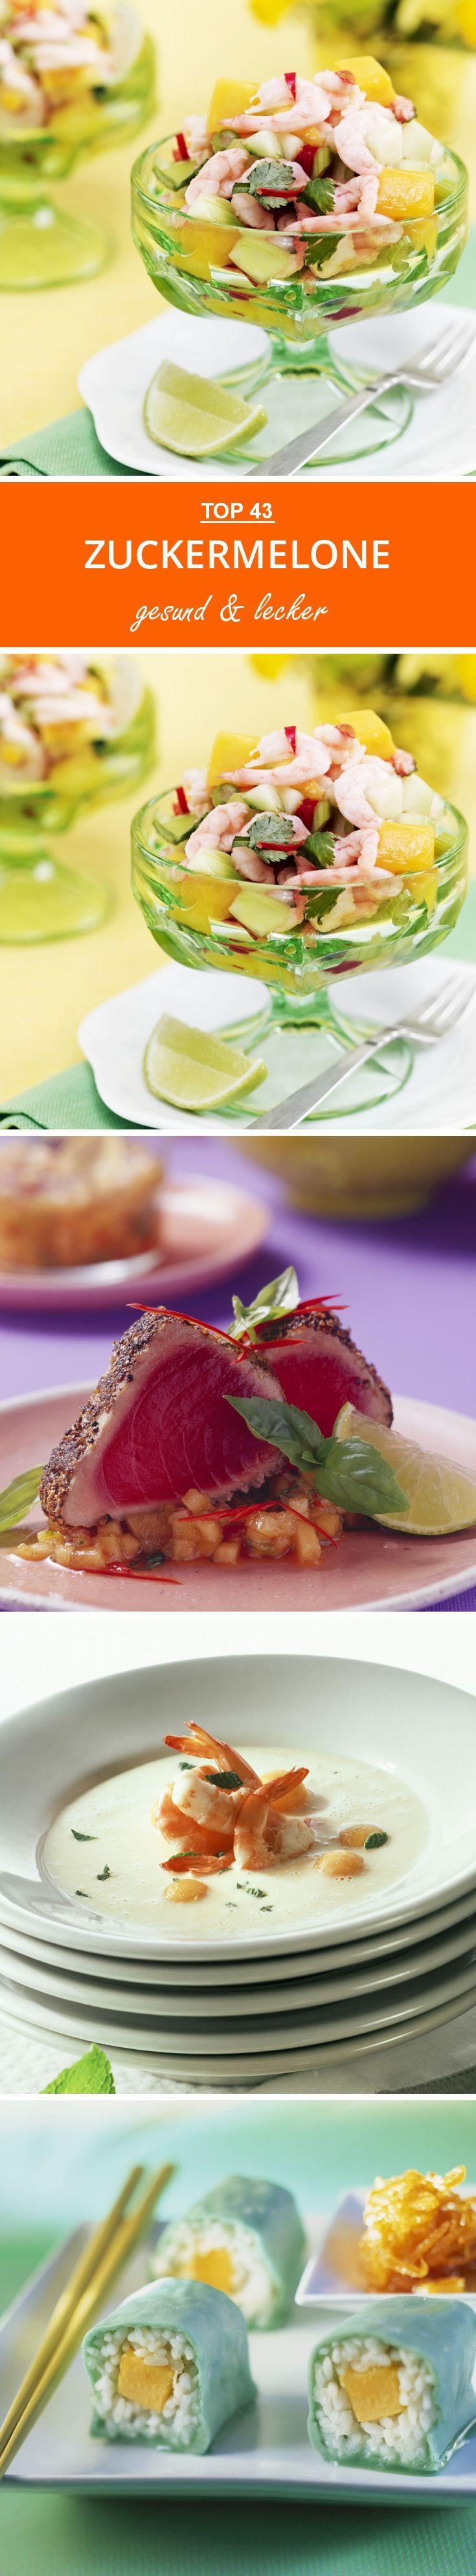 Zuckermelone | eatsmarter.de